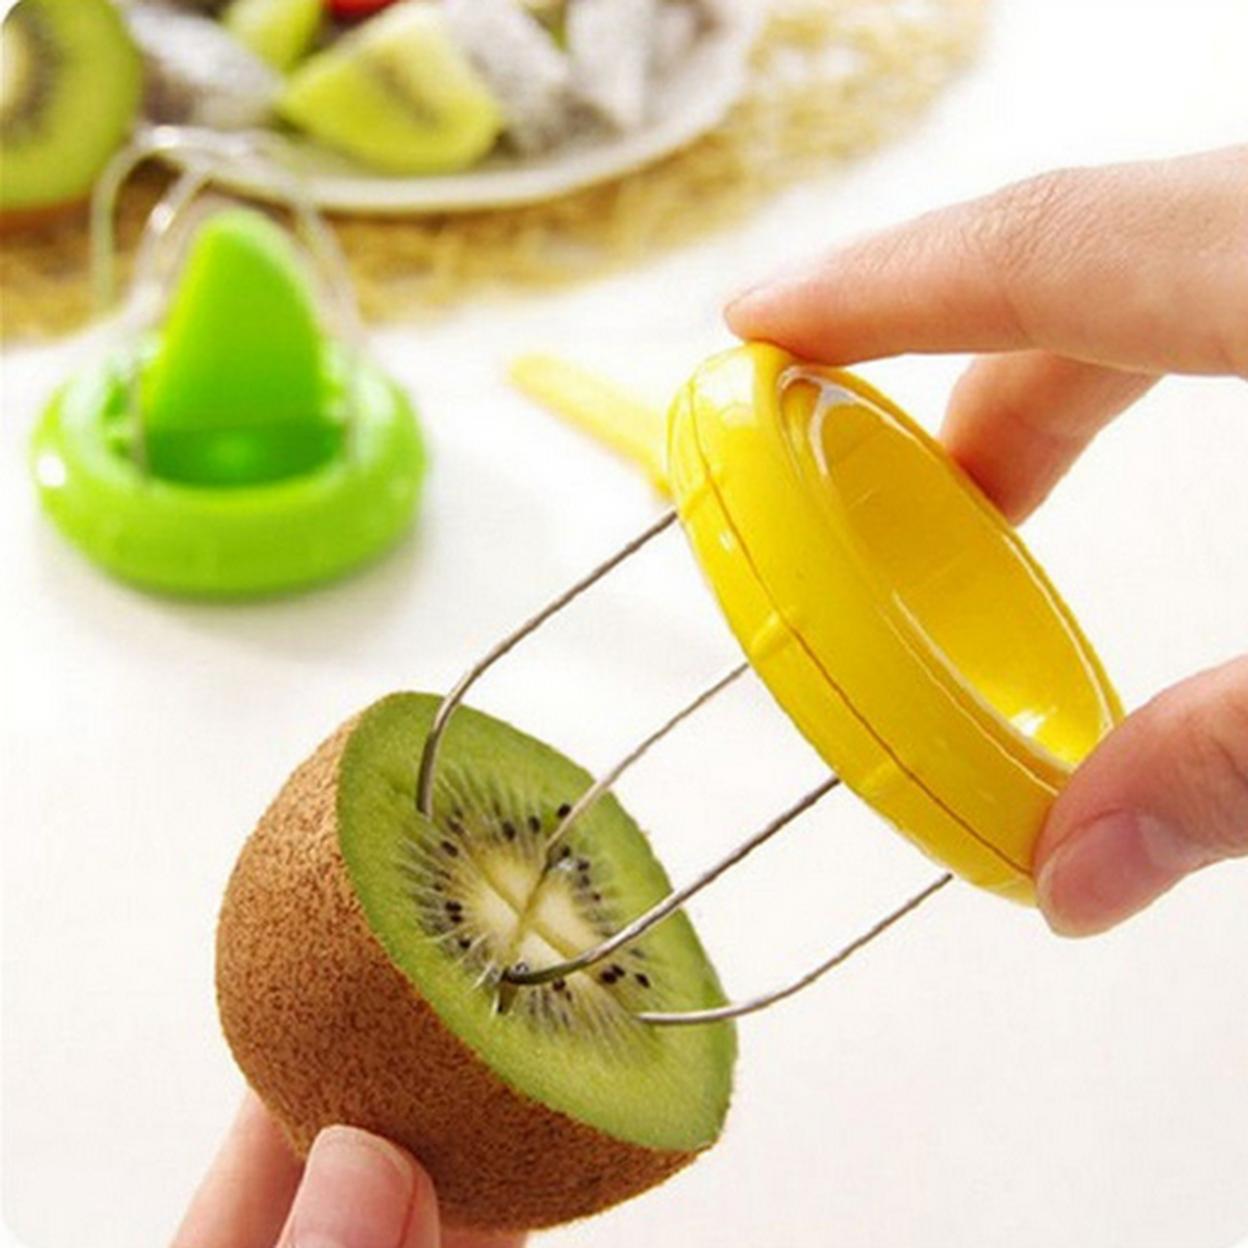 2pcs Mini Fruit Kiwi Cutter Peeler Slicer Kitchen Gadgets Tools For Pitaya Green Hot Sale